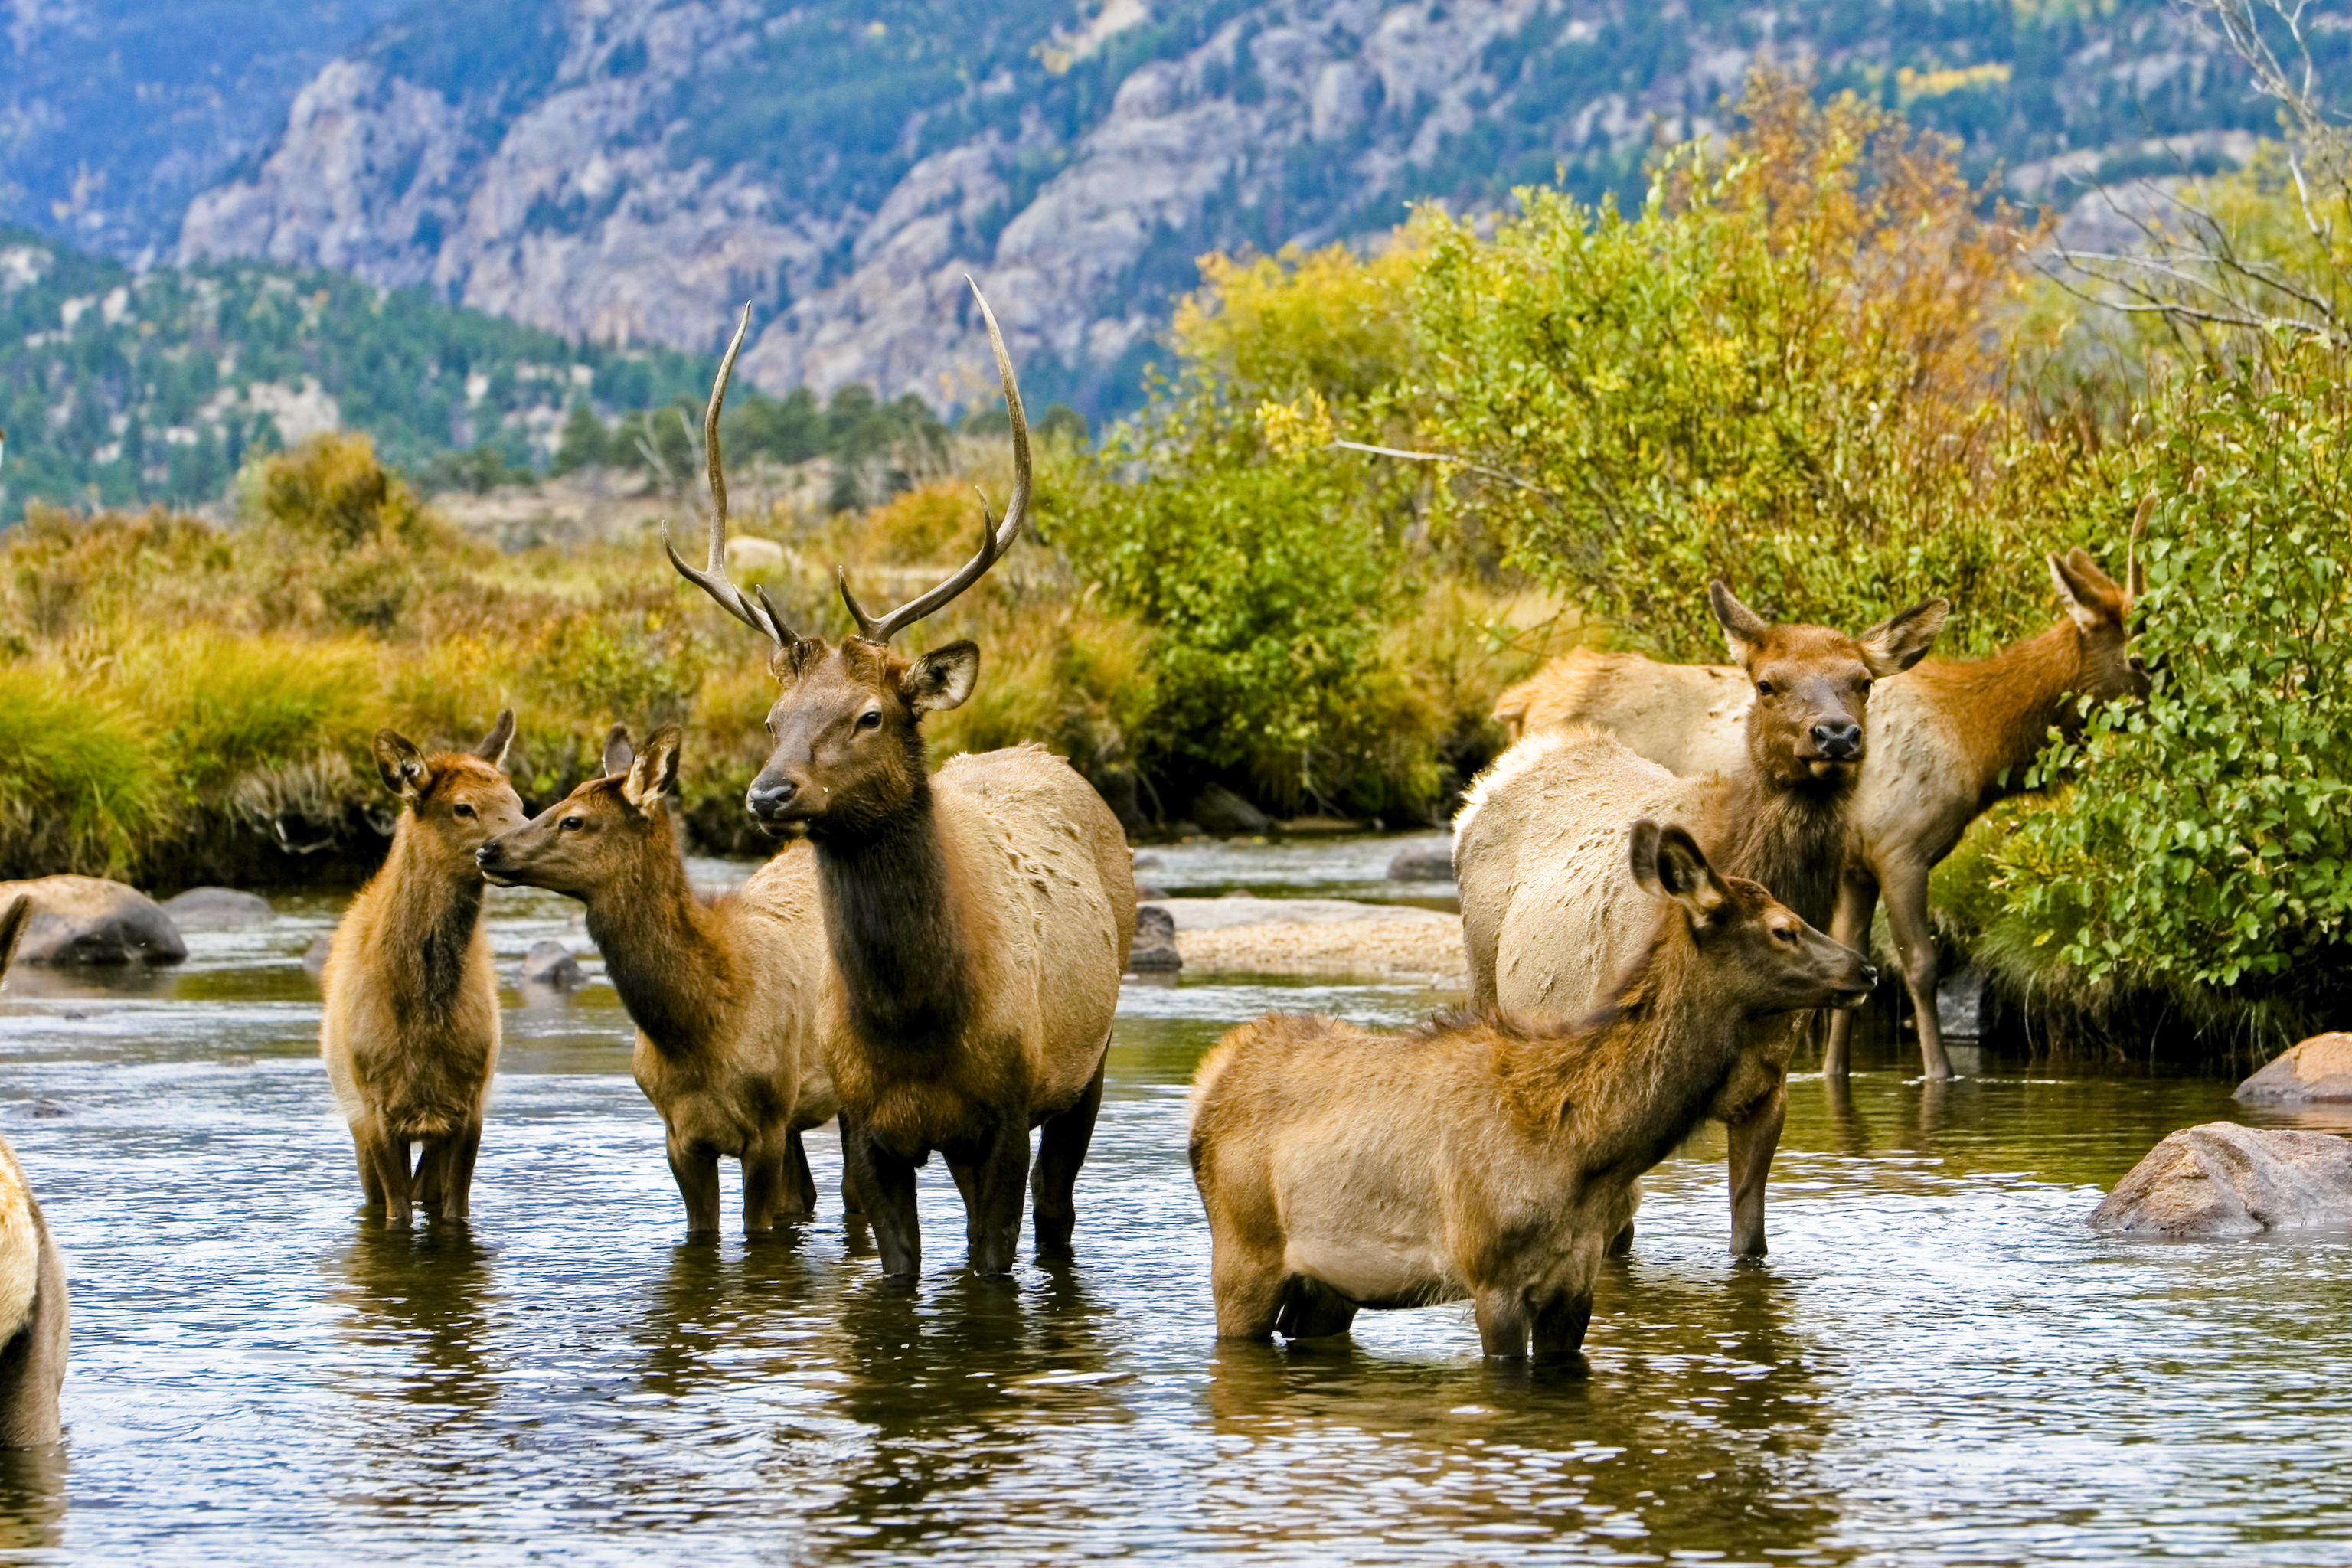 The Call of Nature; Yoho National Park, British Columbia